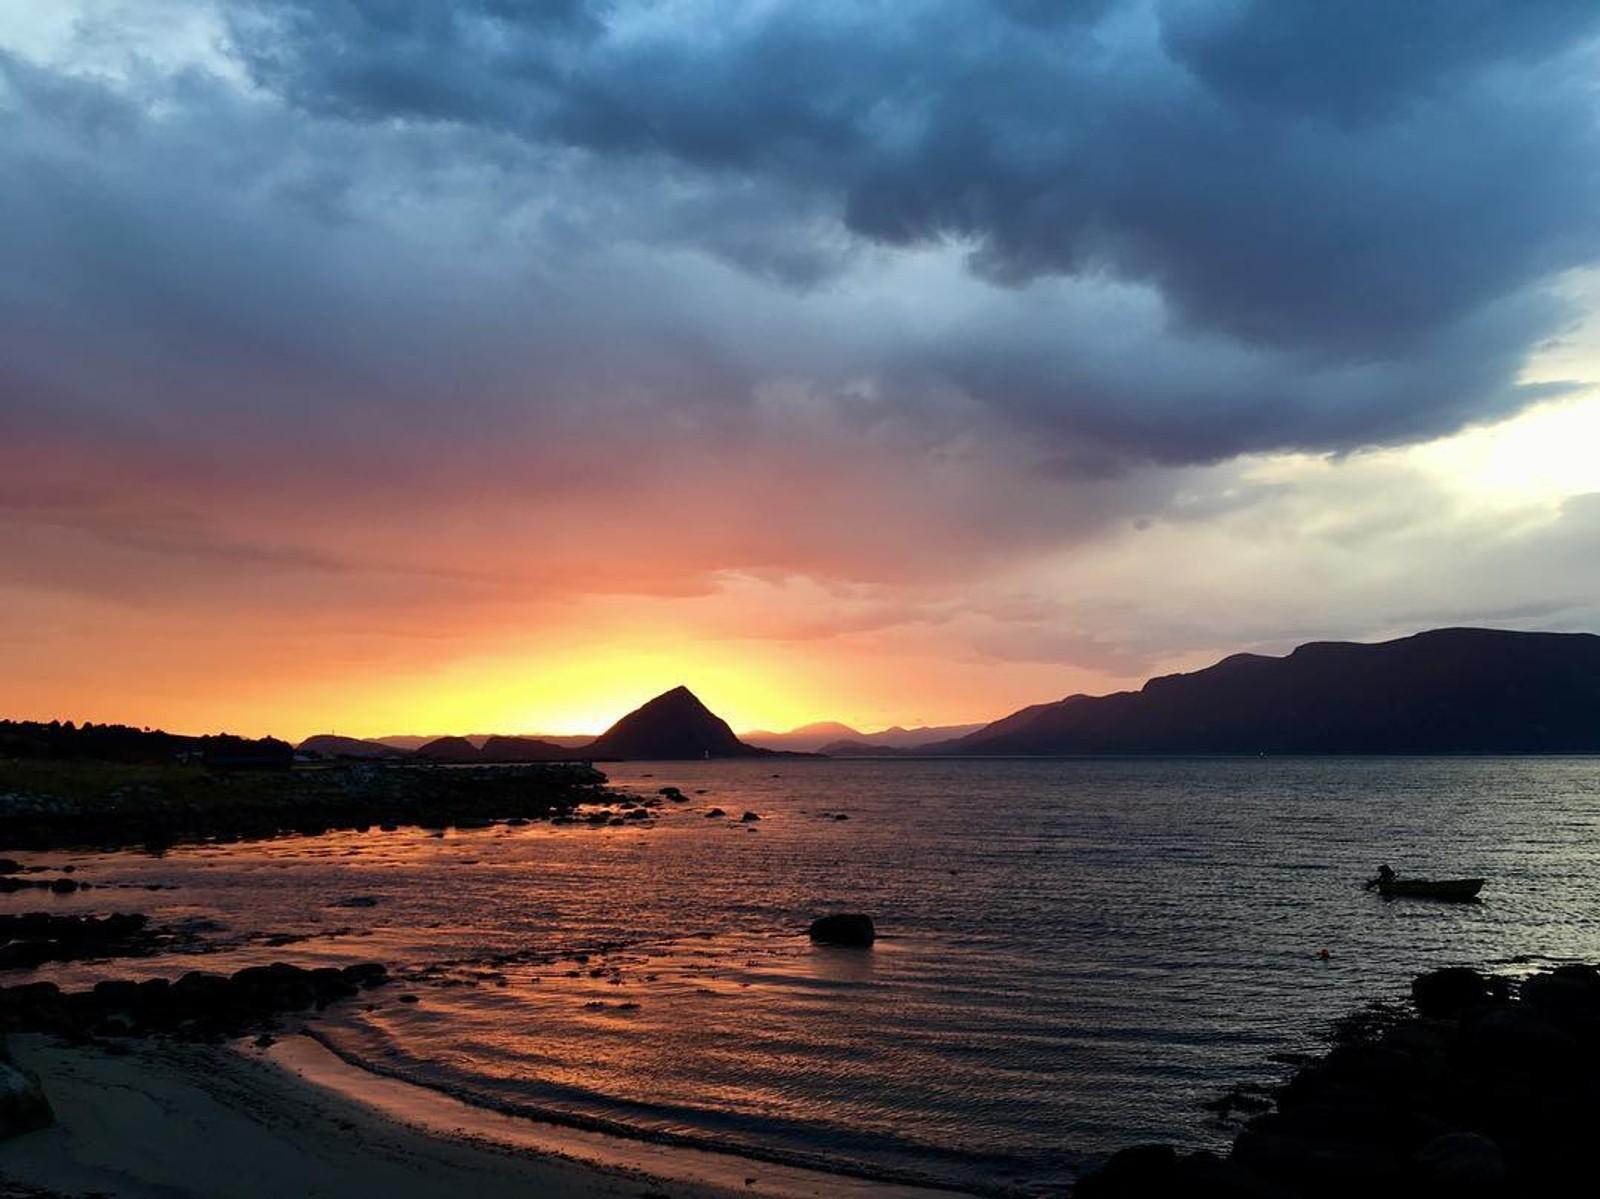 philzeilOn our daily way to work.. philzeil#norge #norway #sunrise #redsky #fireinthesky #nature #ocean #mountains #nrkmogr #nyttiuka #traveldestination #instadaily #photooftheday #mittnorge #mittvestland #autumn